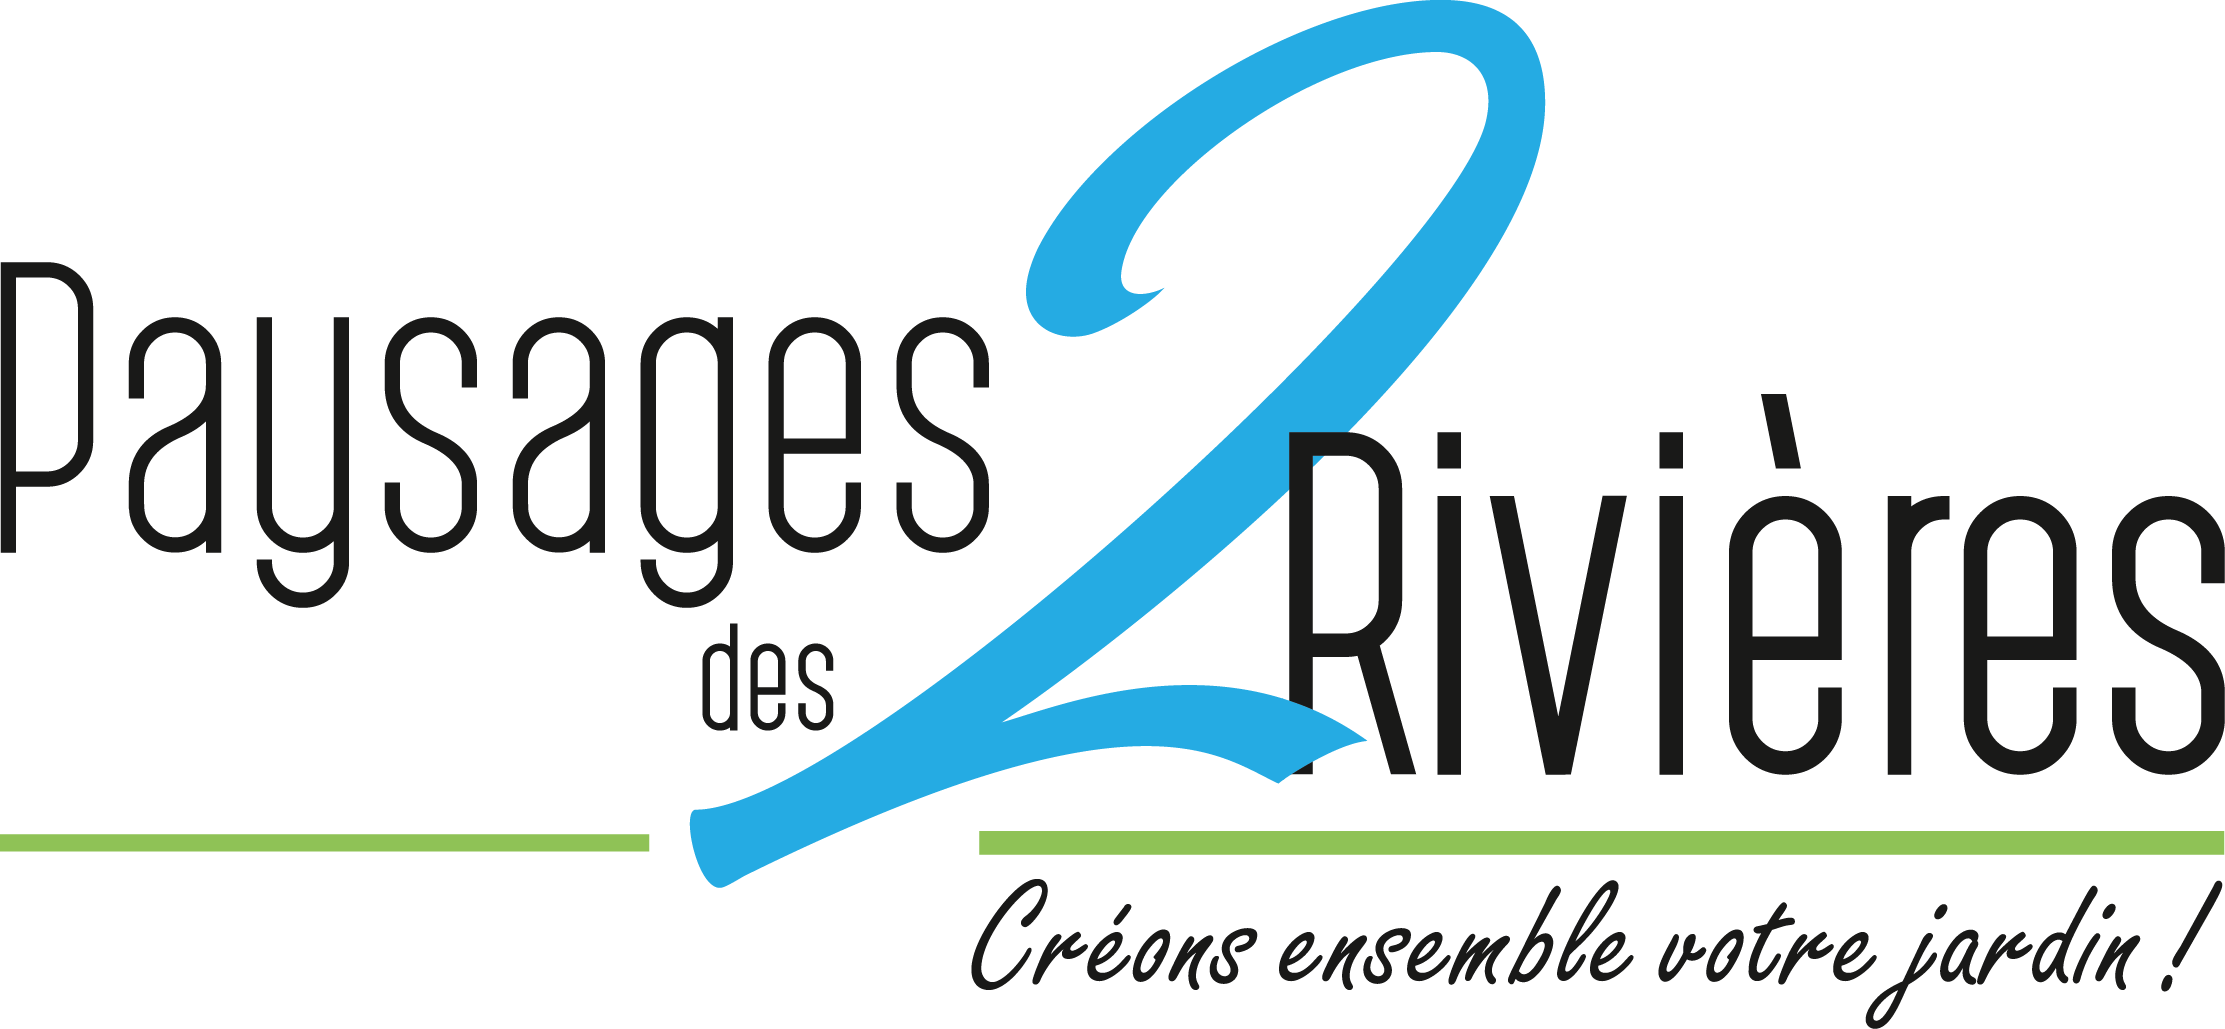 Logotype Paysagiste 2 rivières Nantes